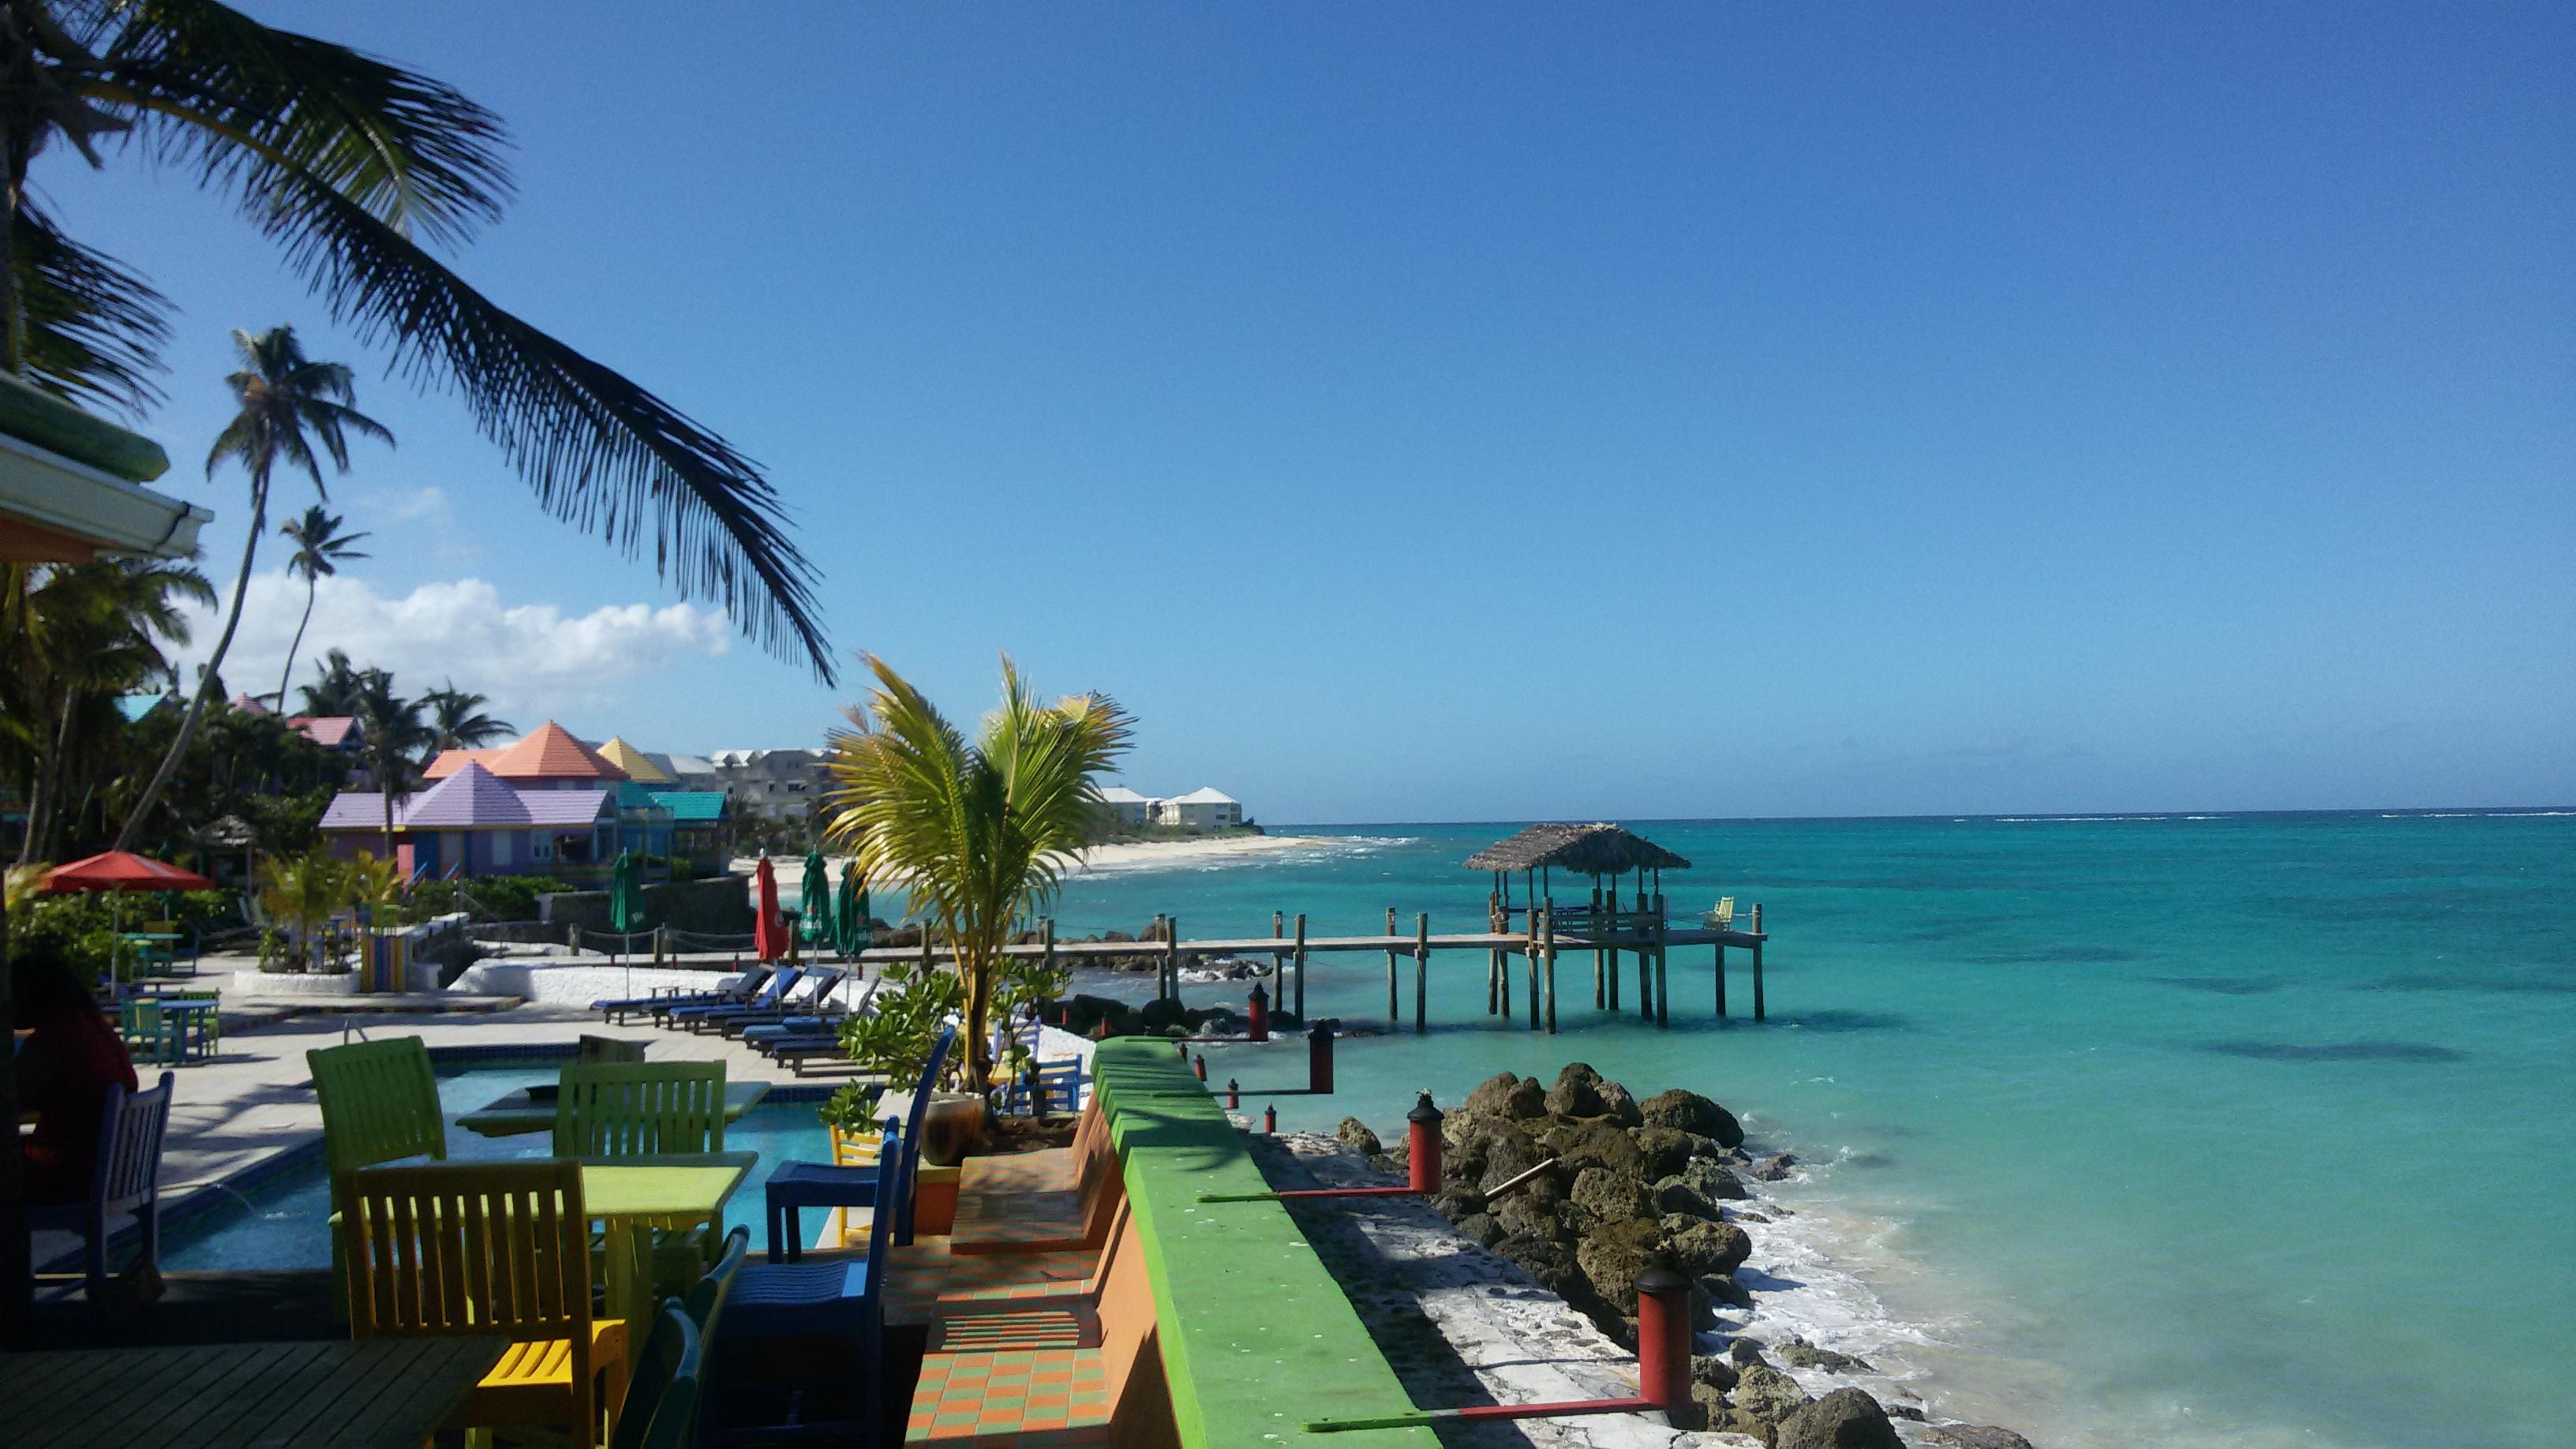 Bahamas in winter